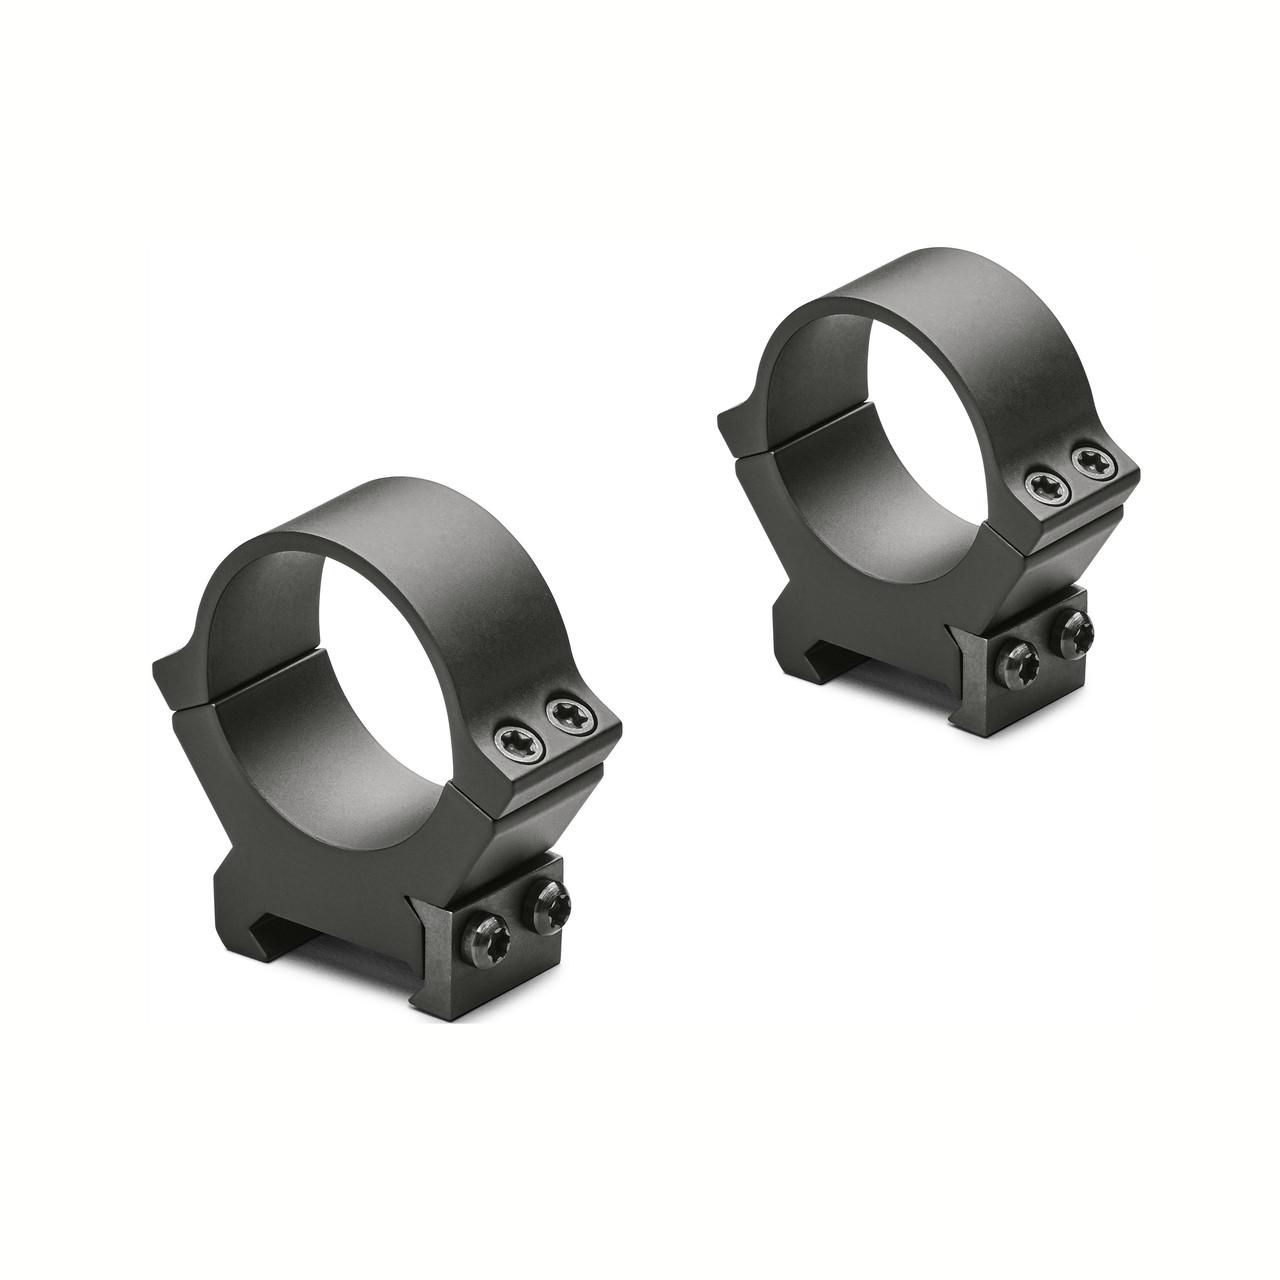 Nouveau Leupold QRW2 Scope Rings 30 mm high gloss 174077